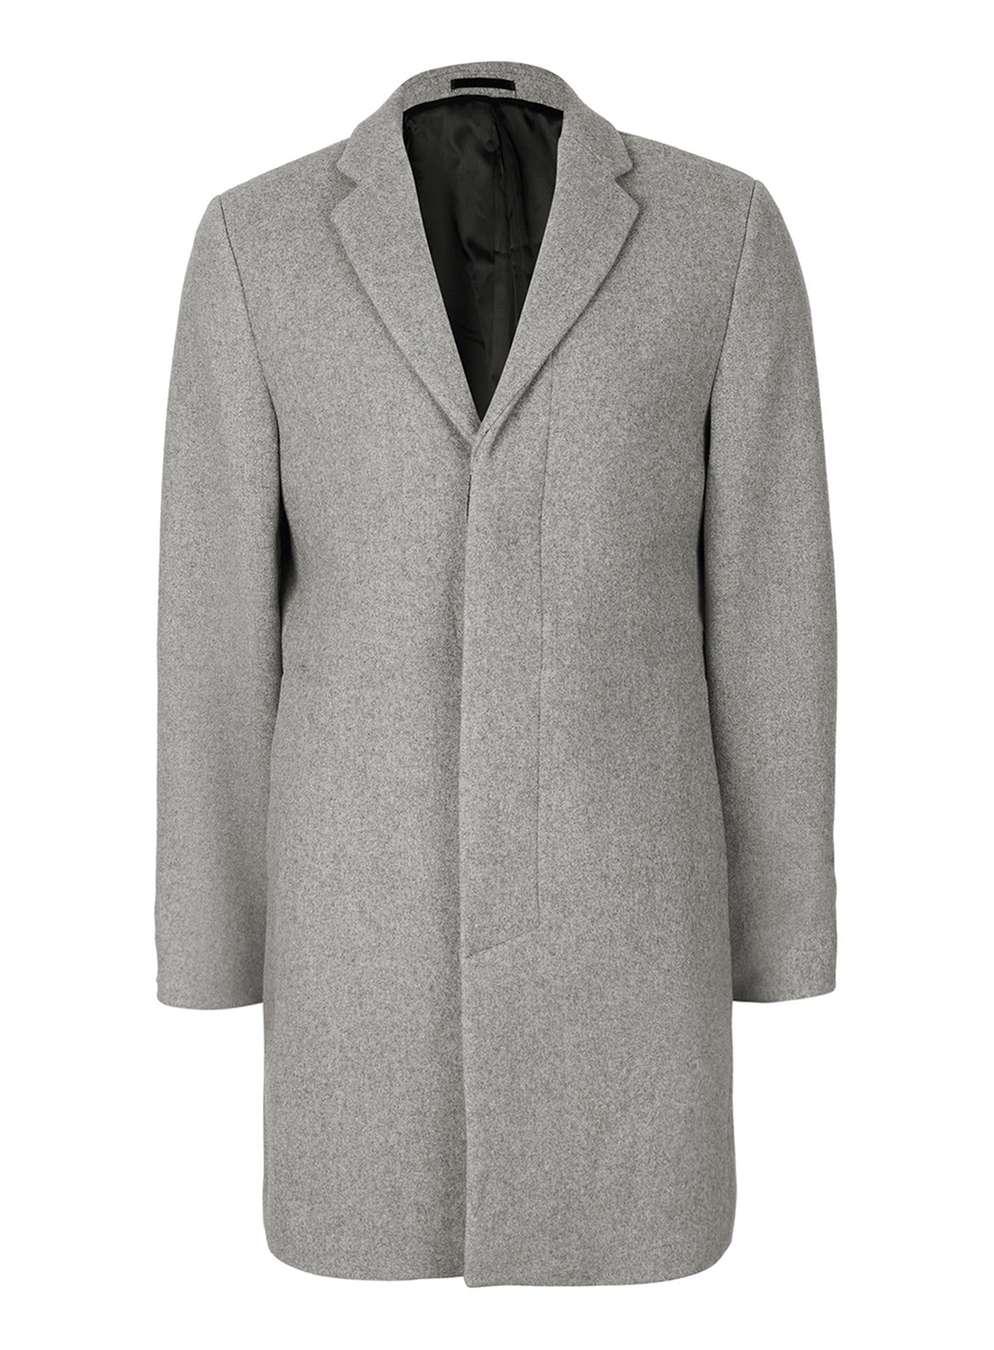 SELECTED HOMME Grey Wool Blend Coat, £200 ( topman.com )